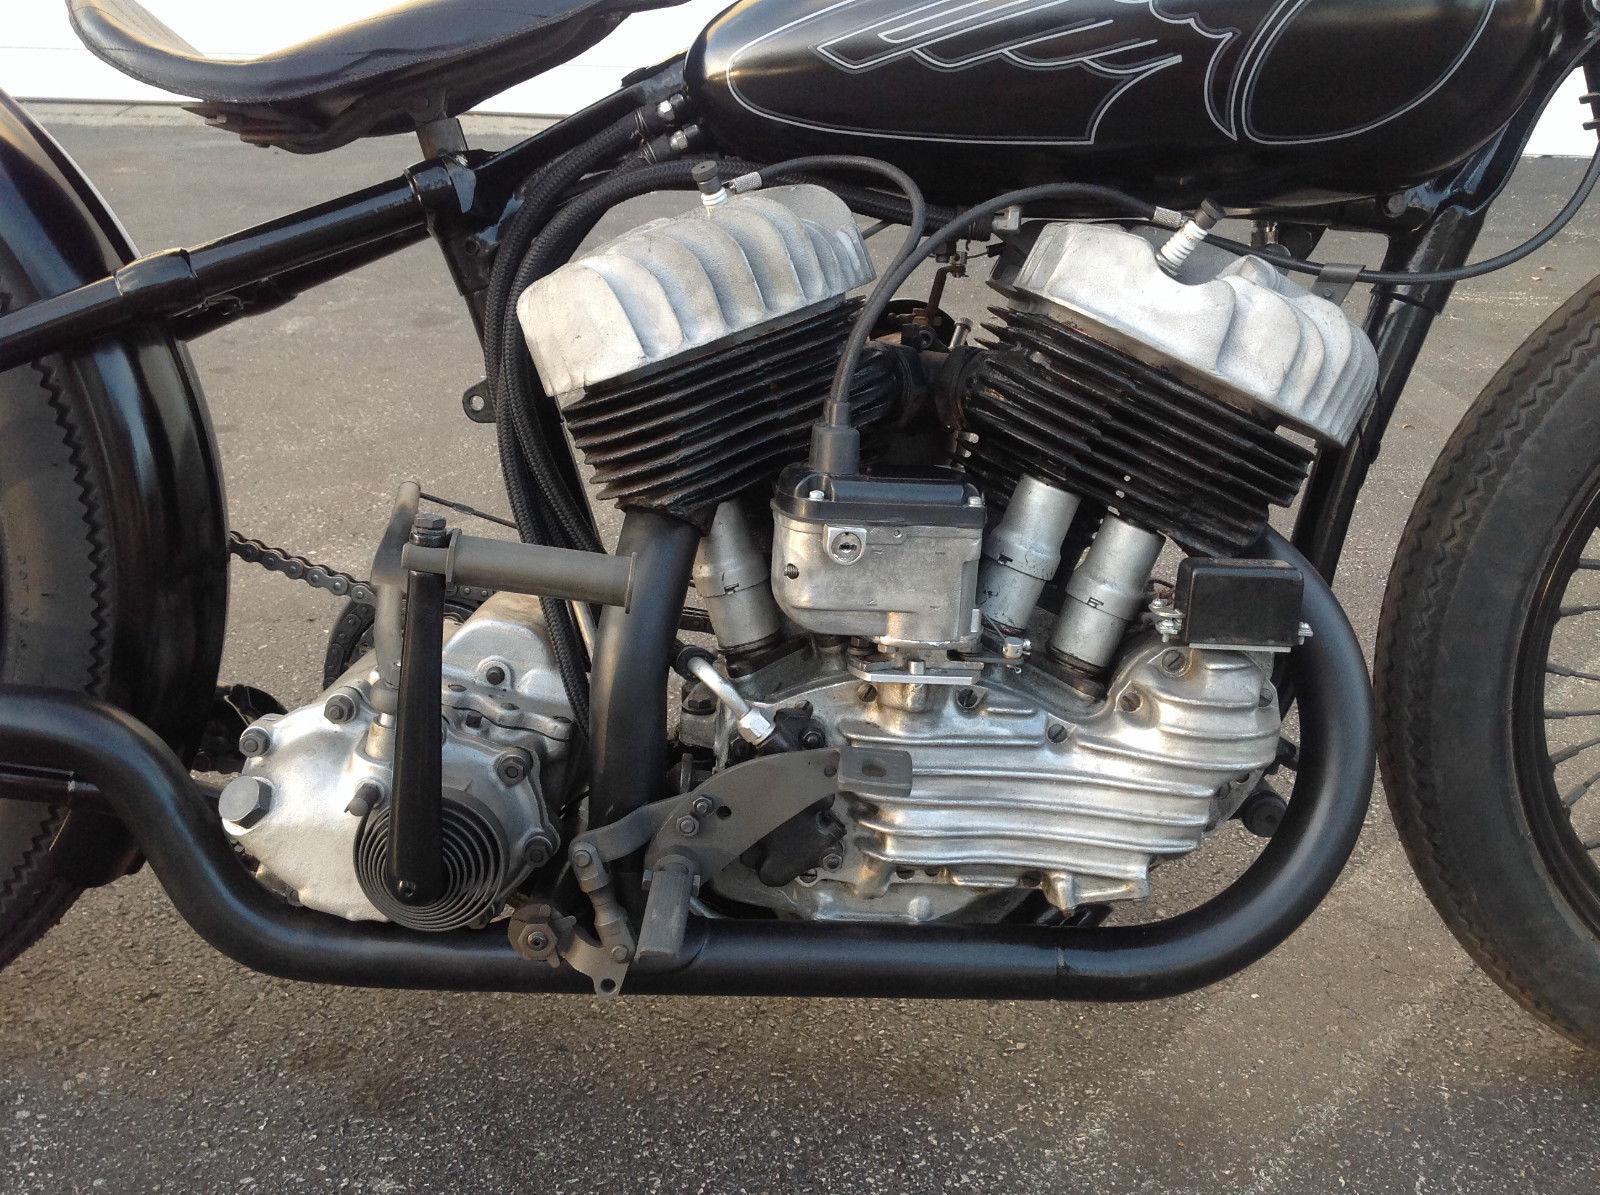 1940 Harley Davidson Flathead Rare UA Knucklehead VL Frame Bobber ...